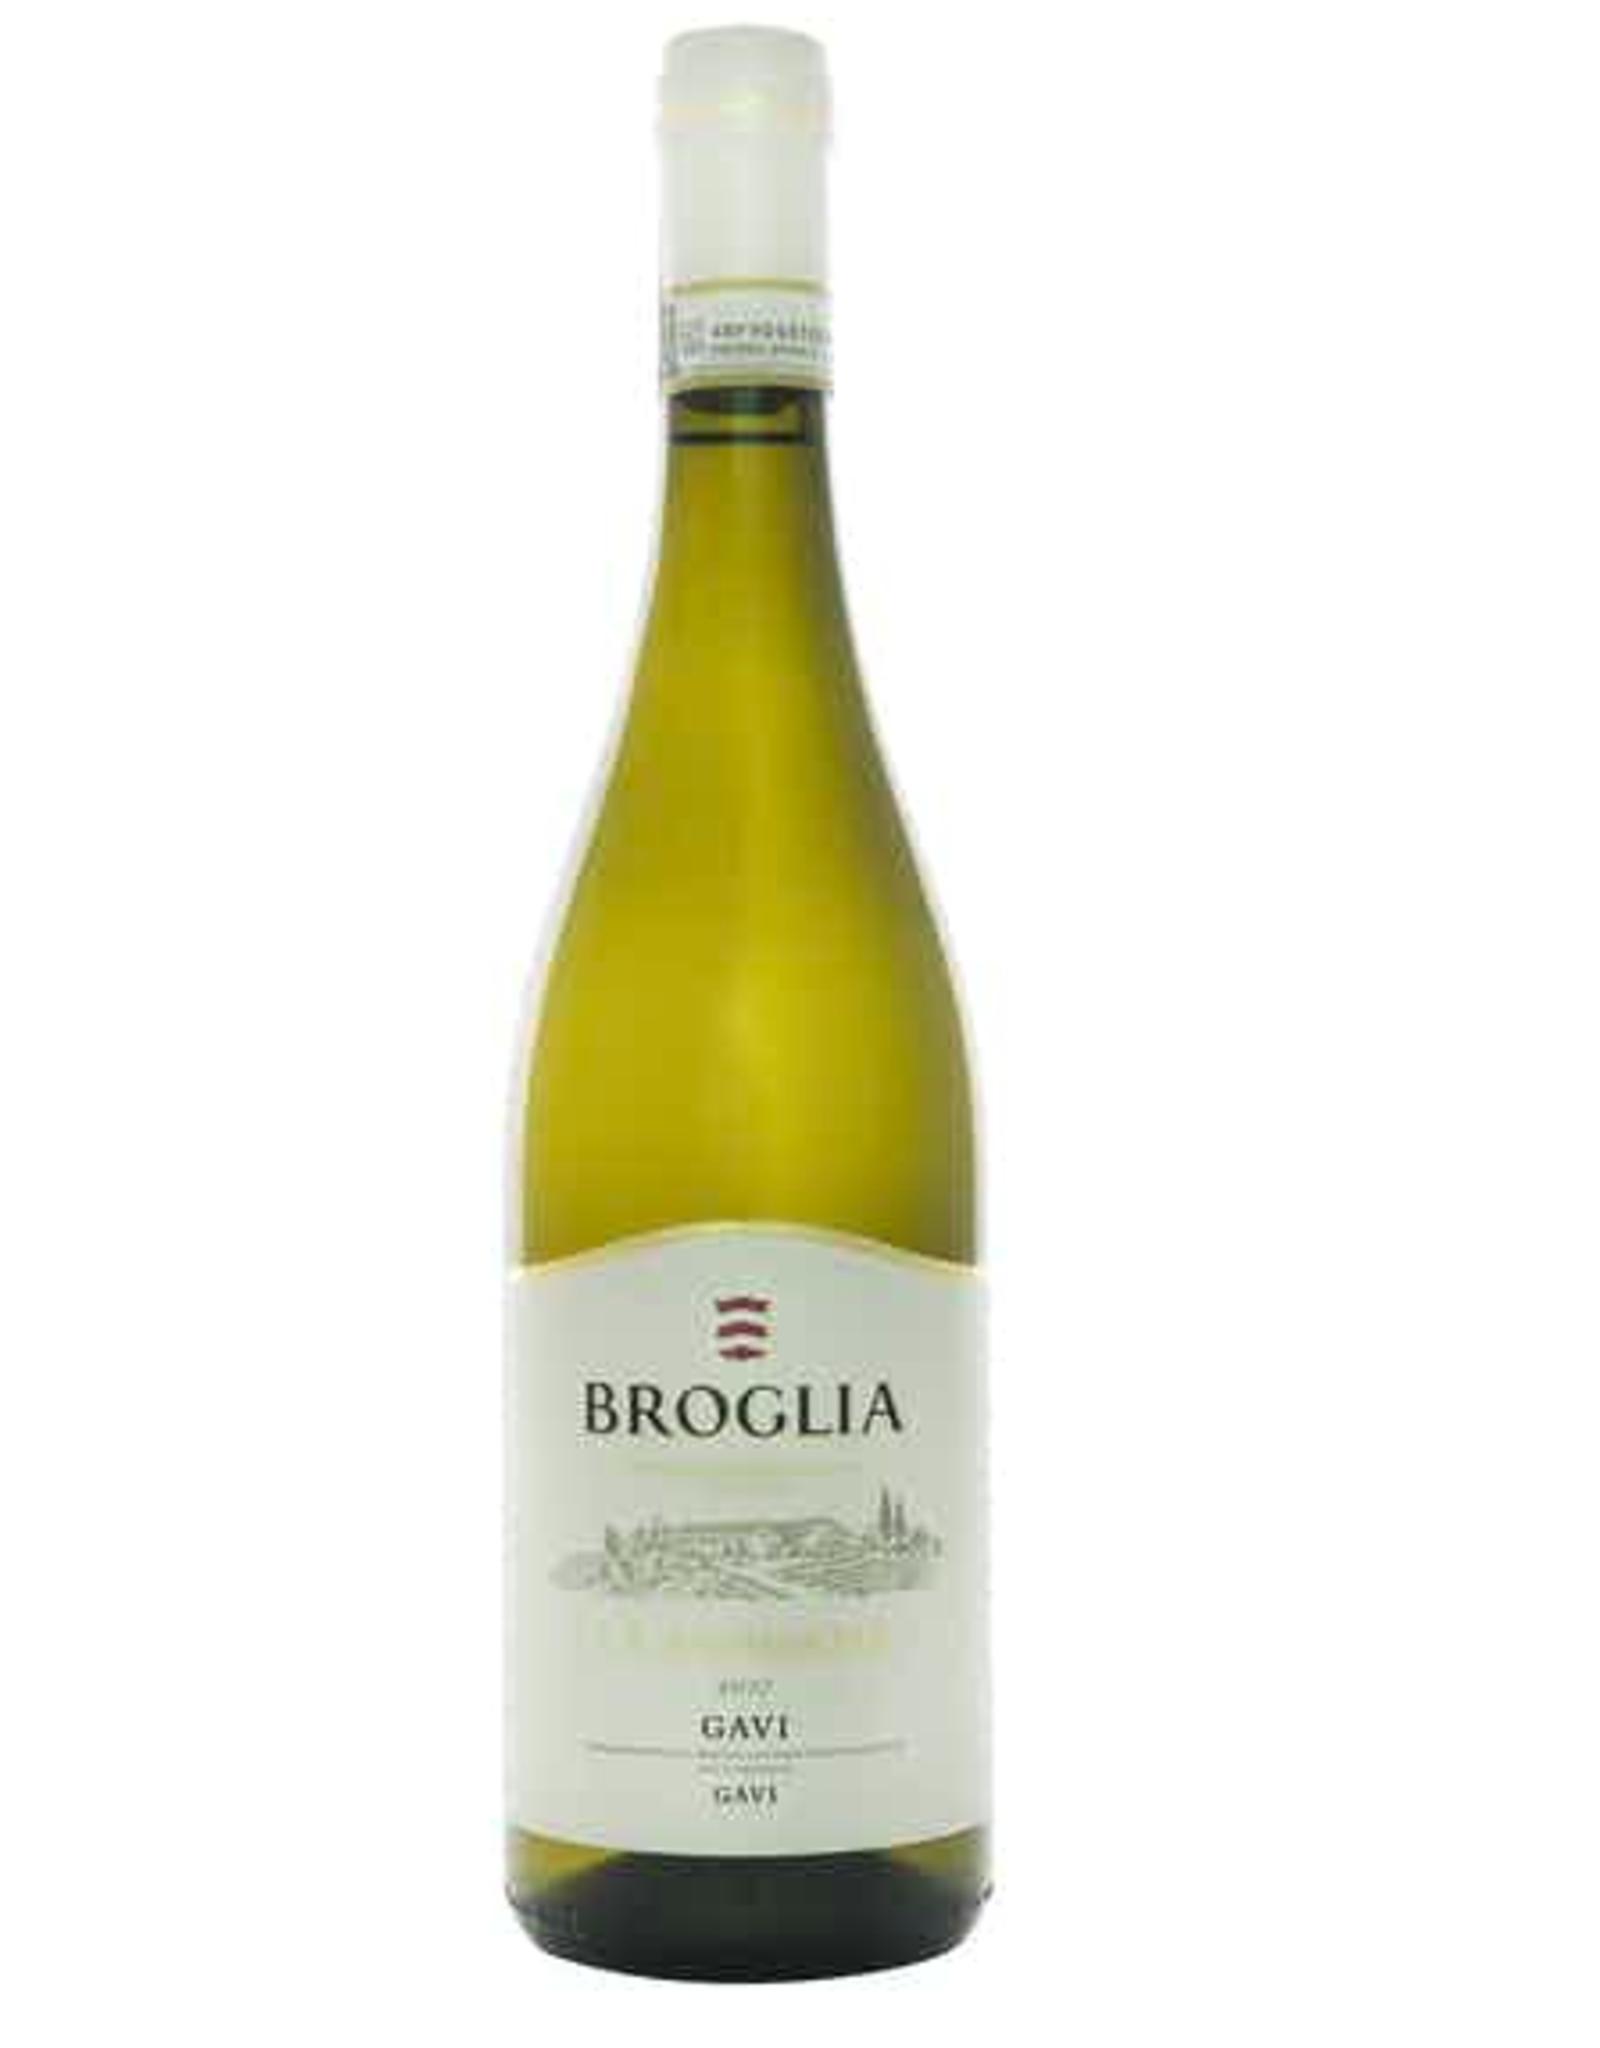 Piero Broglia Broglia Gavi La Meirana 2019